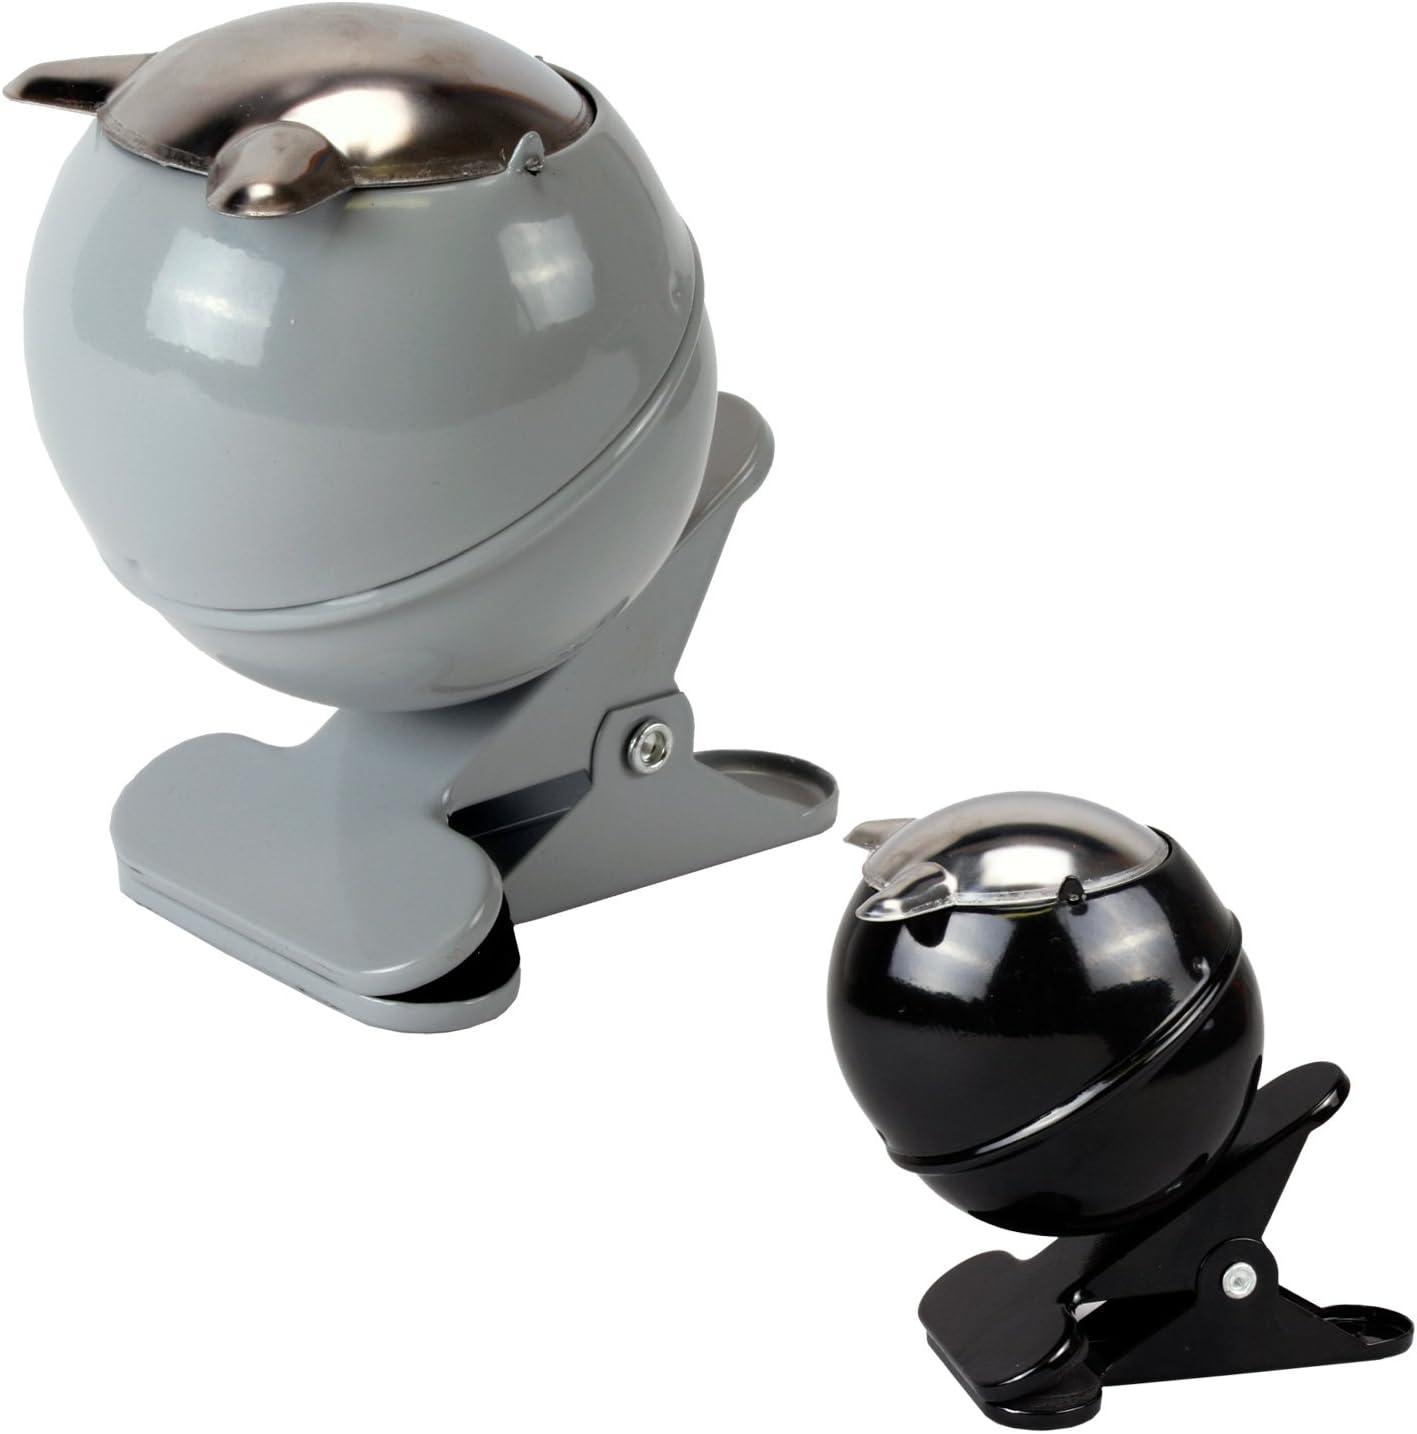 Balkongel/änder etc. schwarz Aschenbecher Sturmaschenbecher Klemmaschenbecher mit Klammer zum Befestigen am Tisch